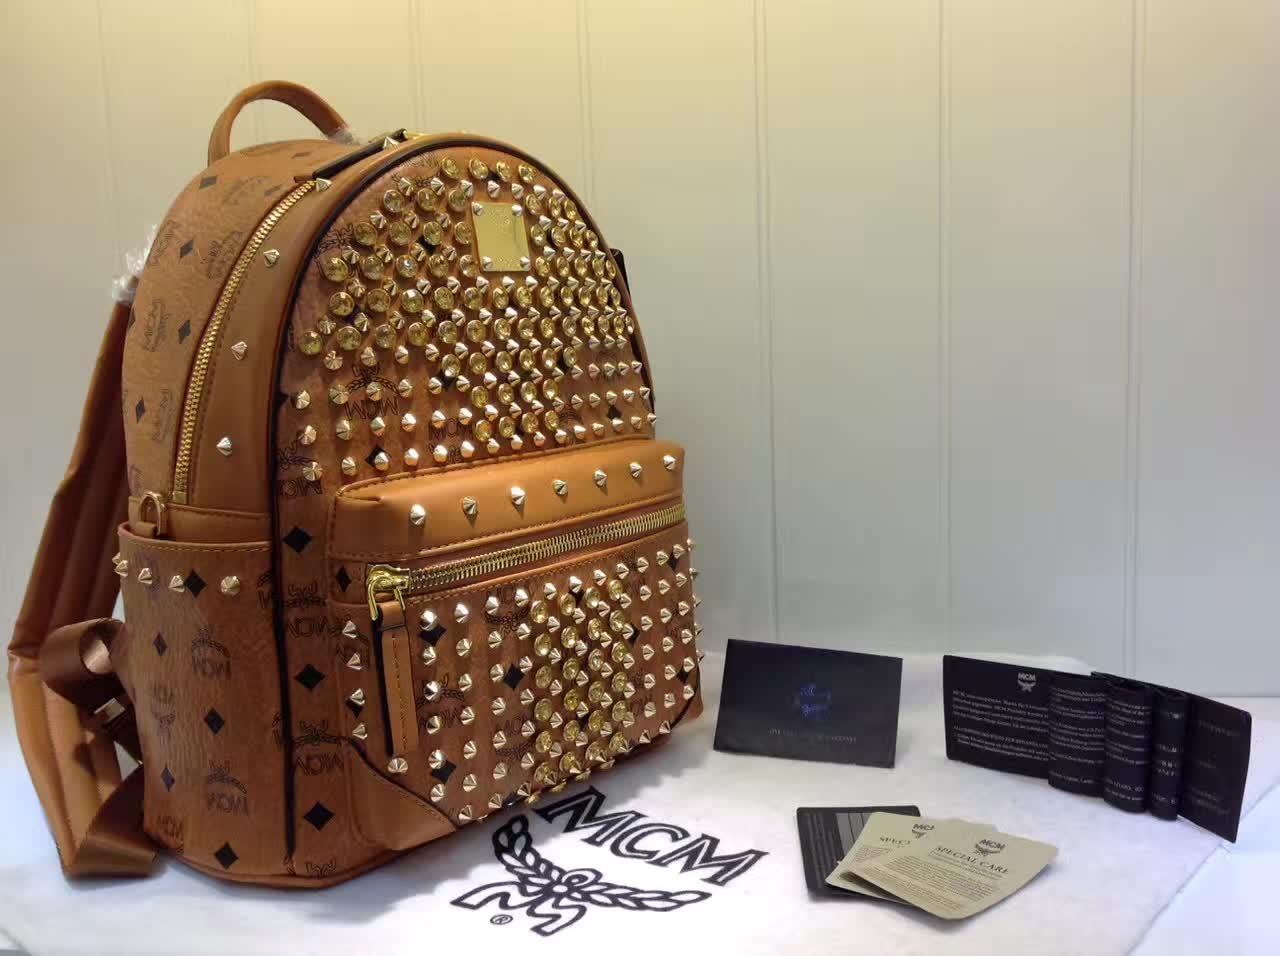 MCM包包批发 BIONIC系列背包 全新金属牌 耐用绒布内里 ykk拉链头配U型扣 土黄